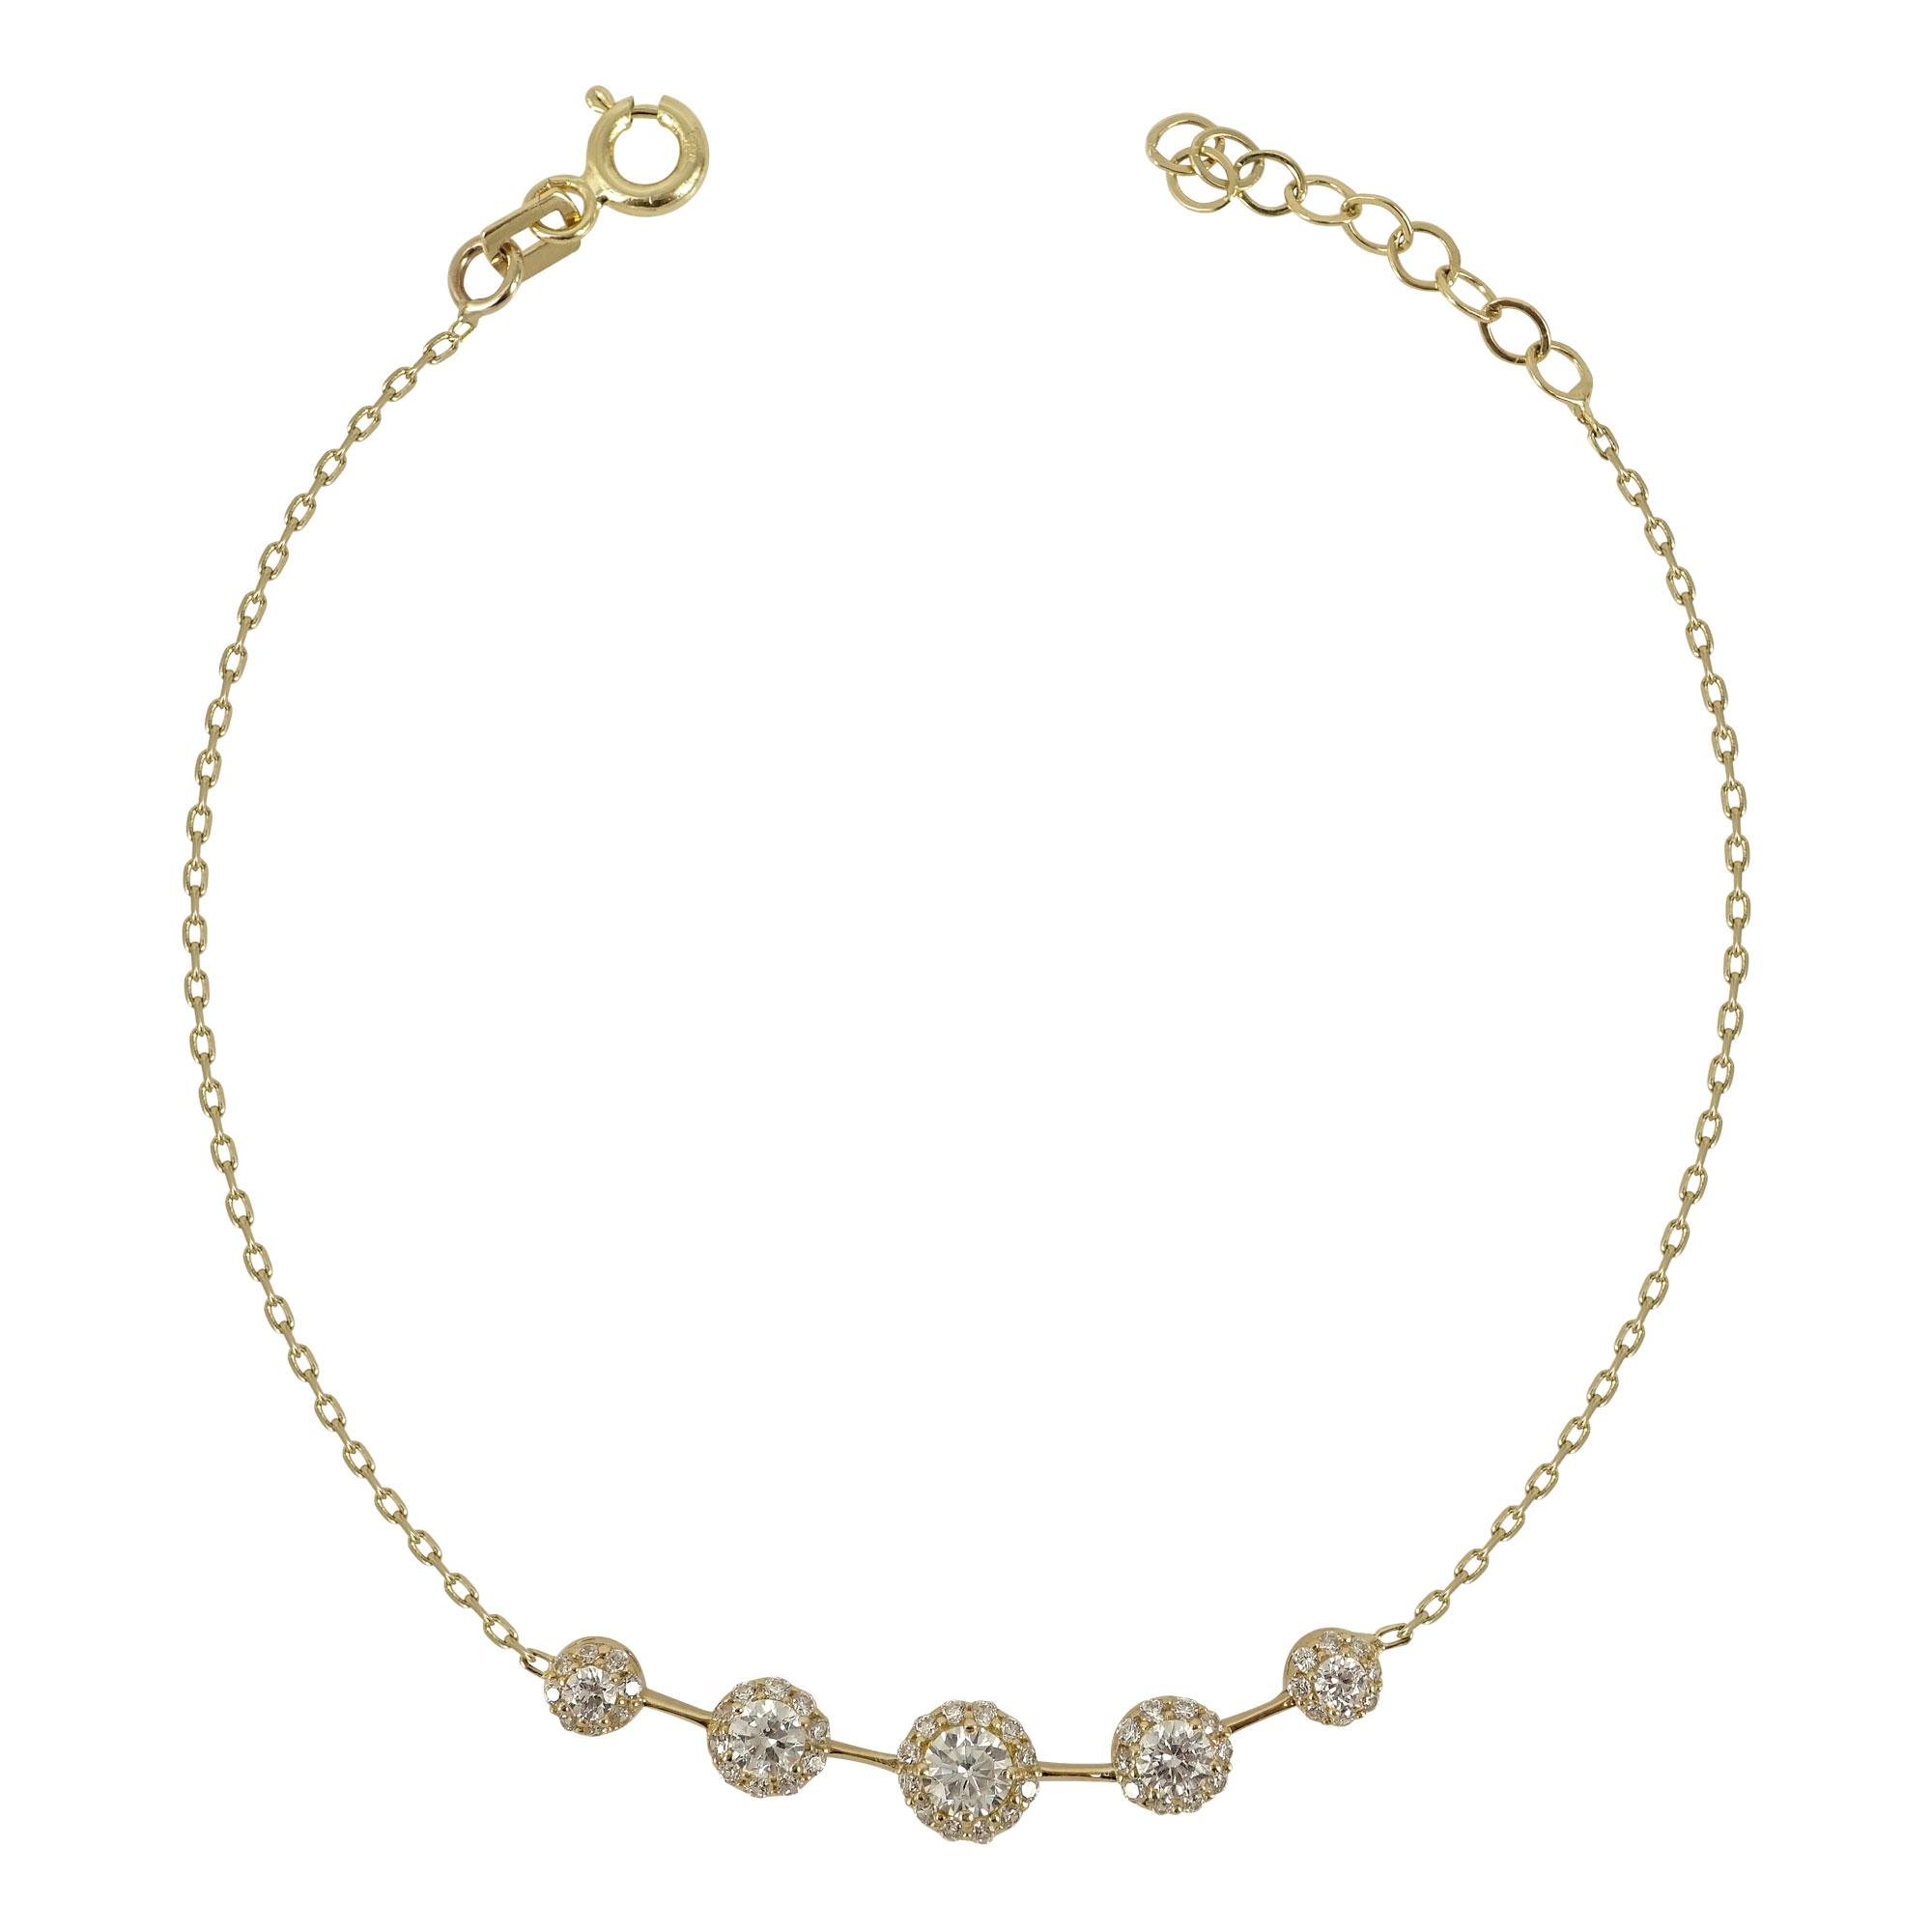 Kίτρινο Χρυσό Βραχιόλι Με Πέτρες Κ14 VR497